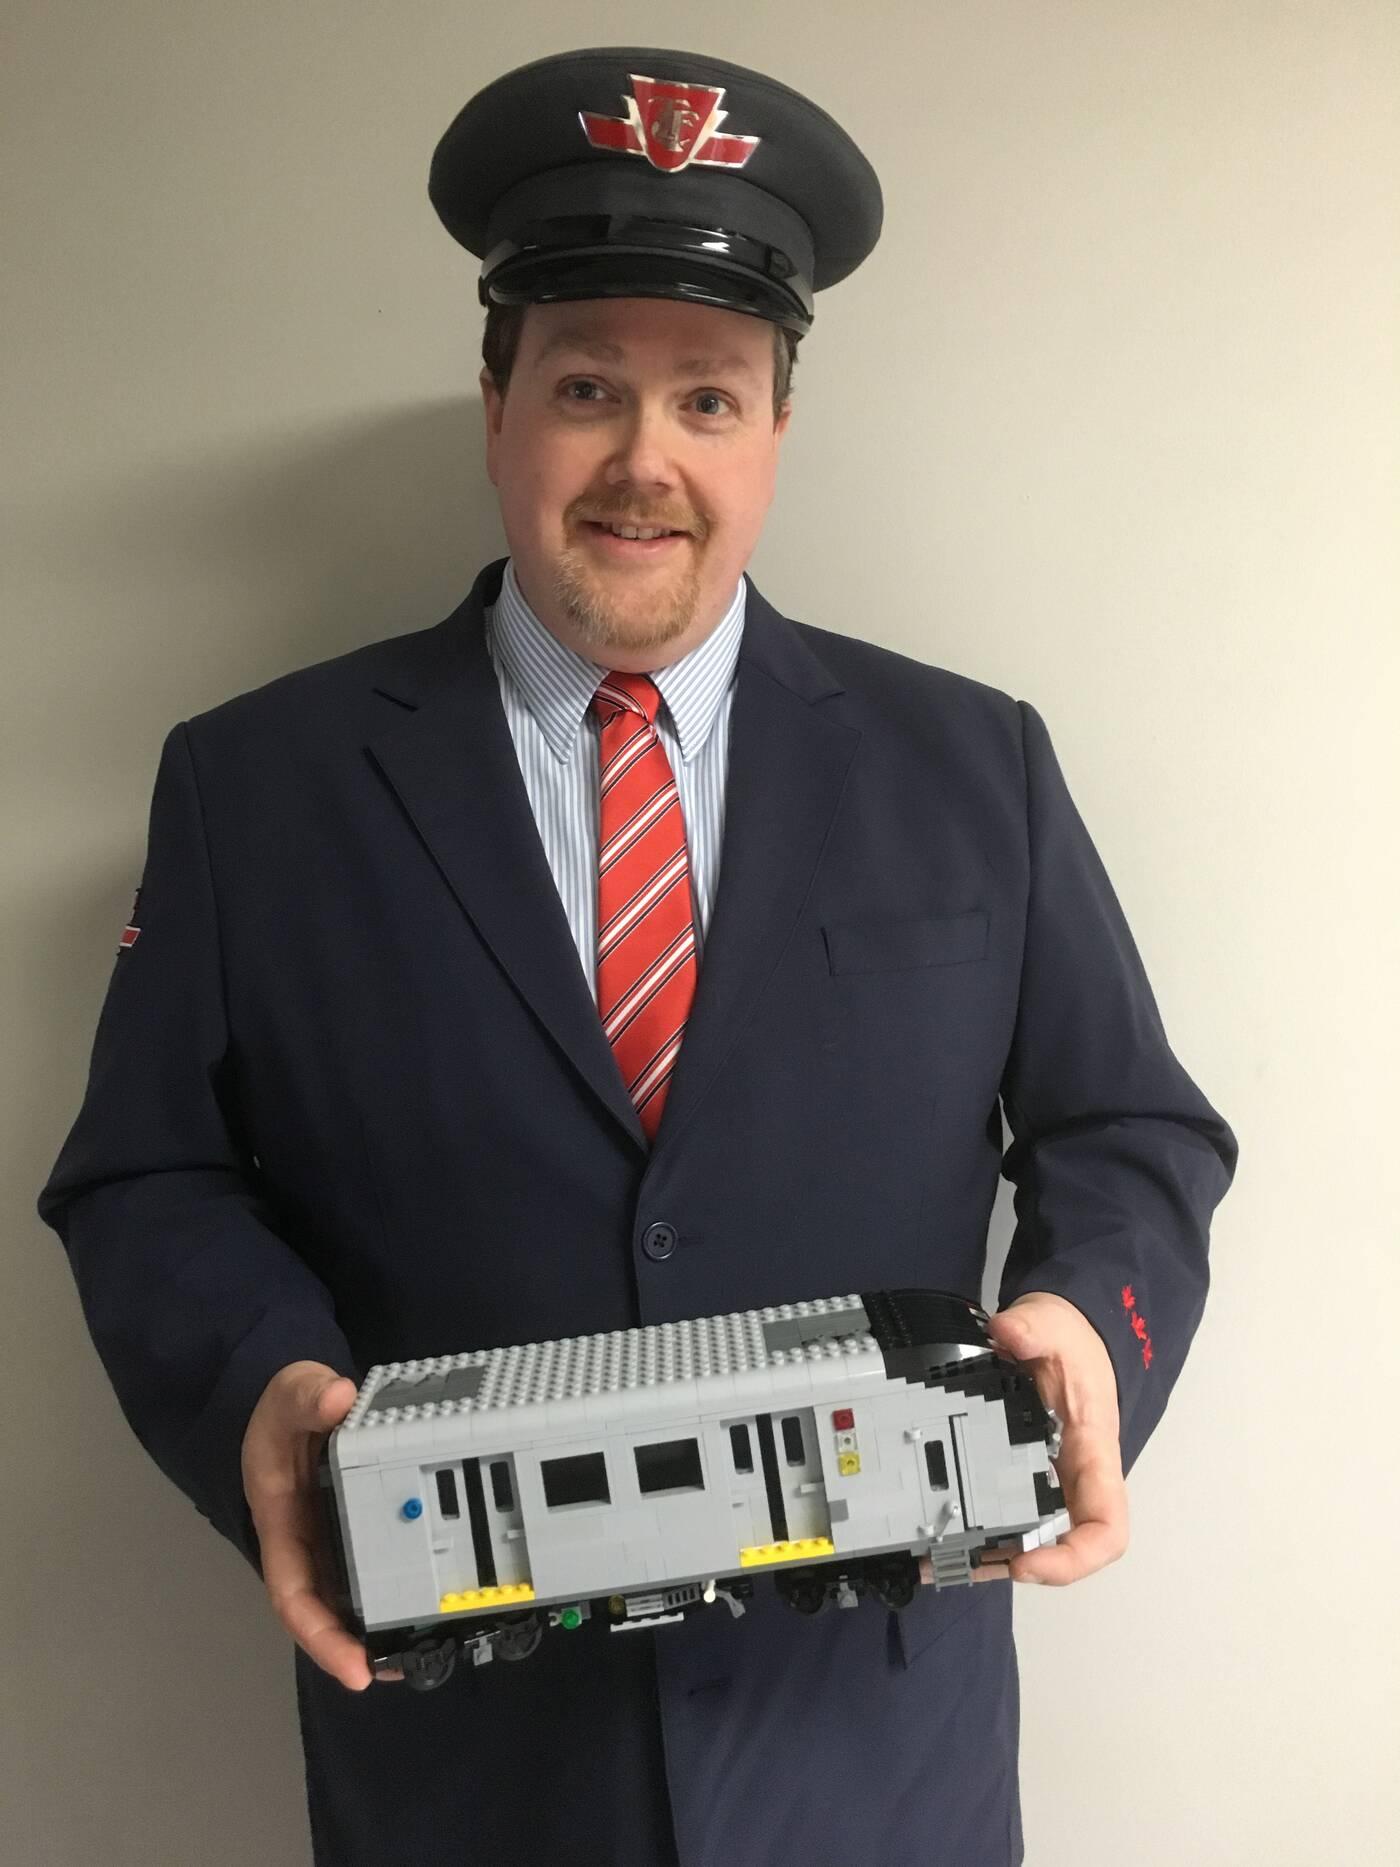 TTC lego train